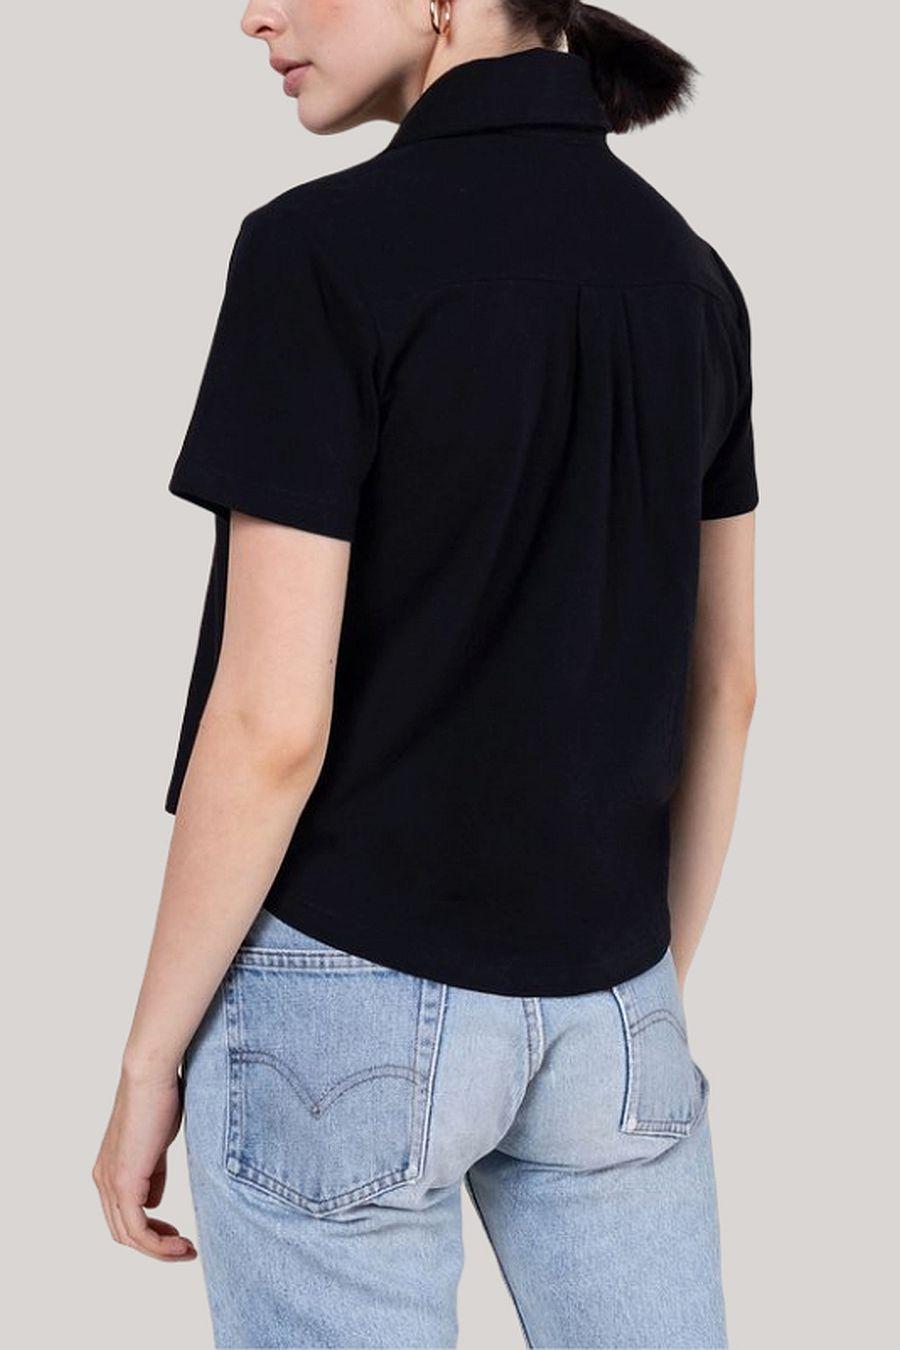 Leset Short Sleeve Button Down - Black